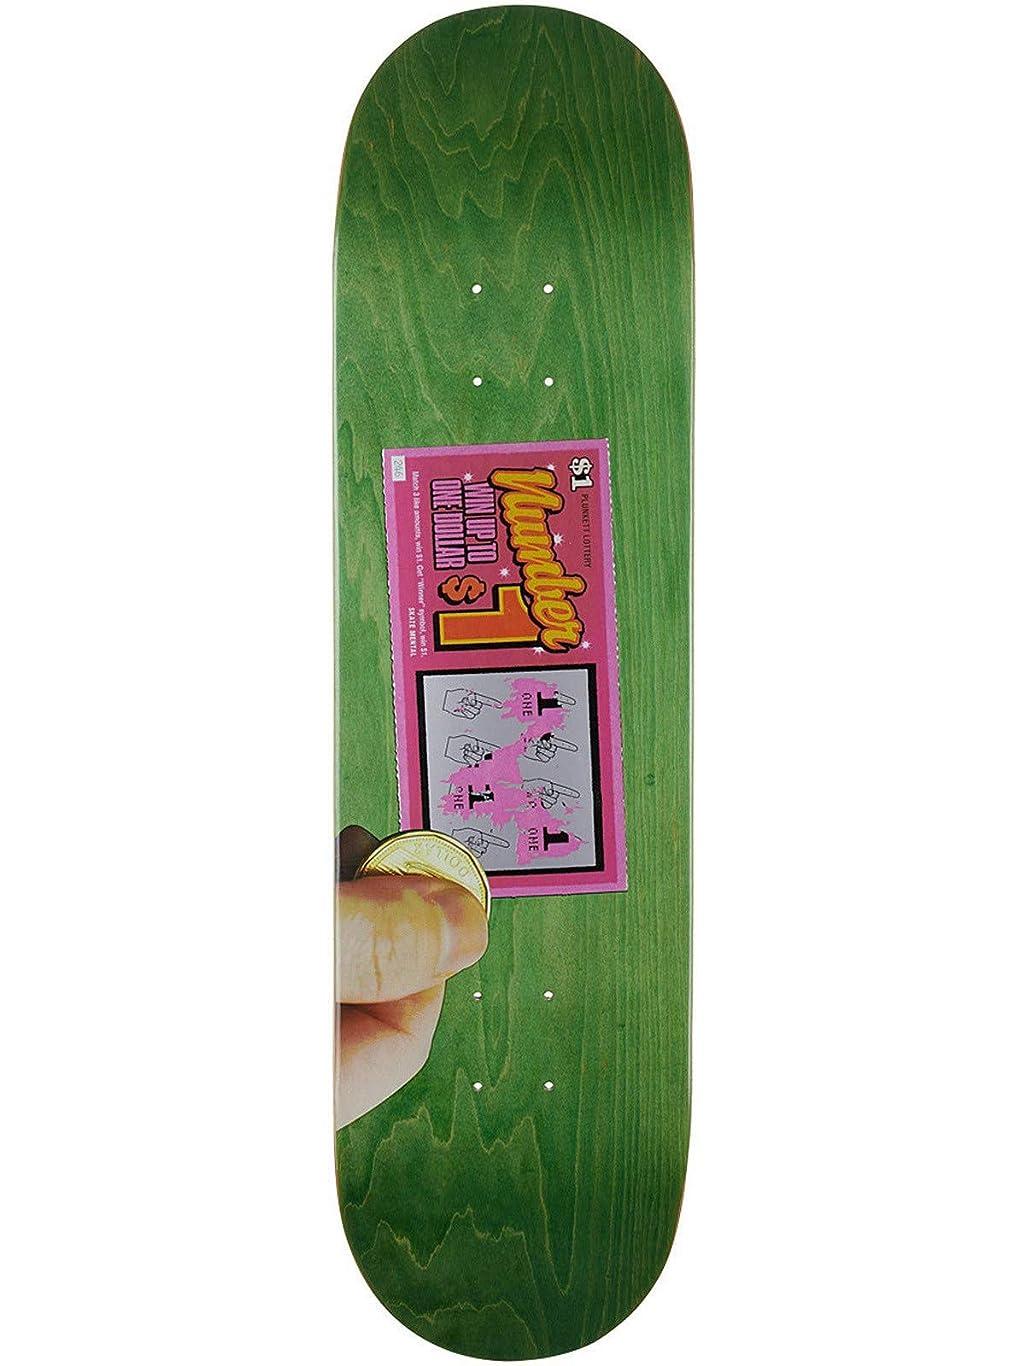 Skate Mental Green Plunkett Scratcher 8.25インチ スケートボードデッキ (デフォルト、グリーン)